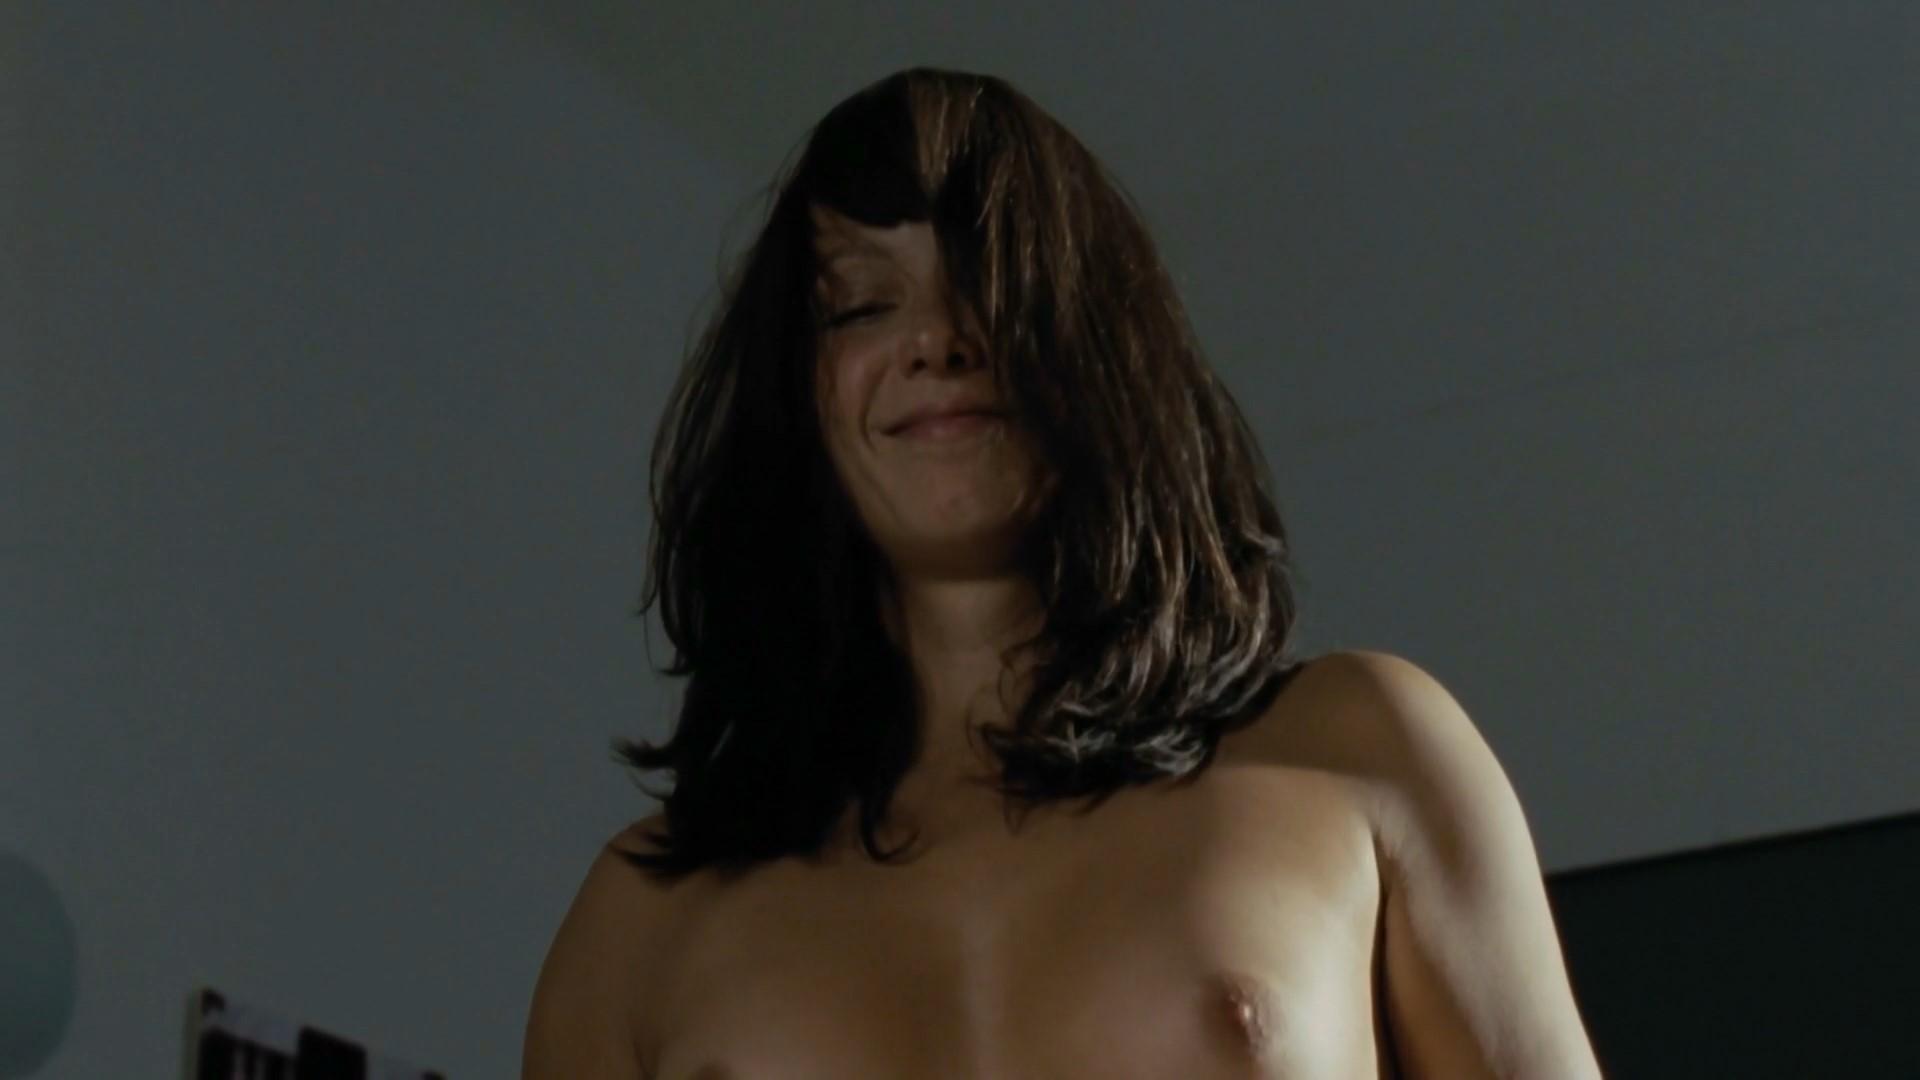 Julia koschitz nackt filme